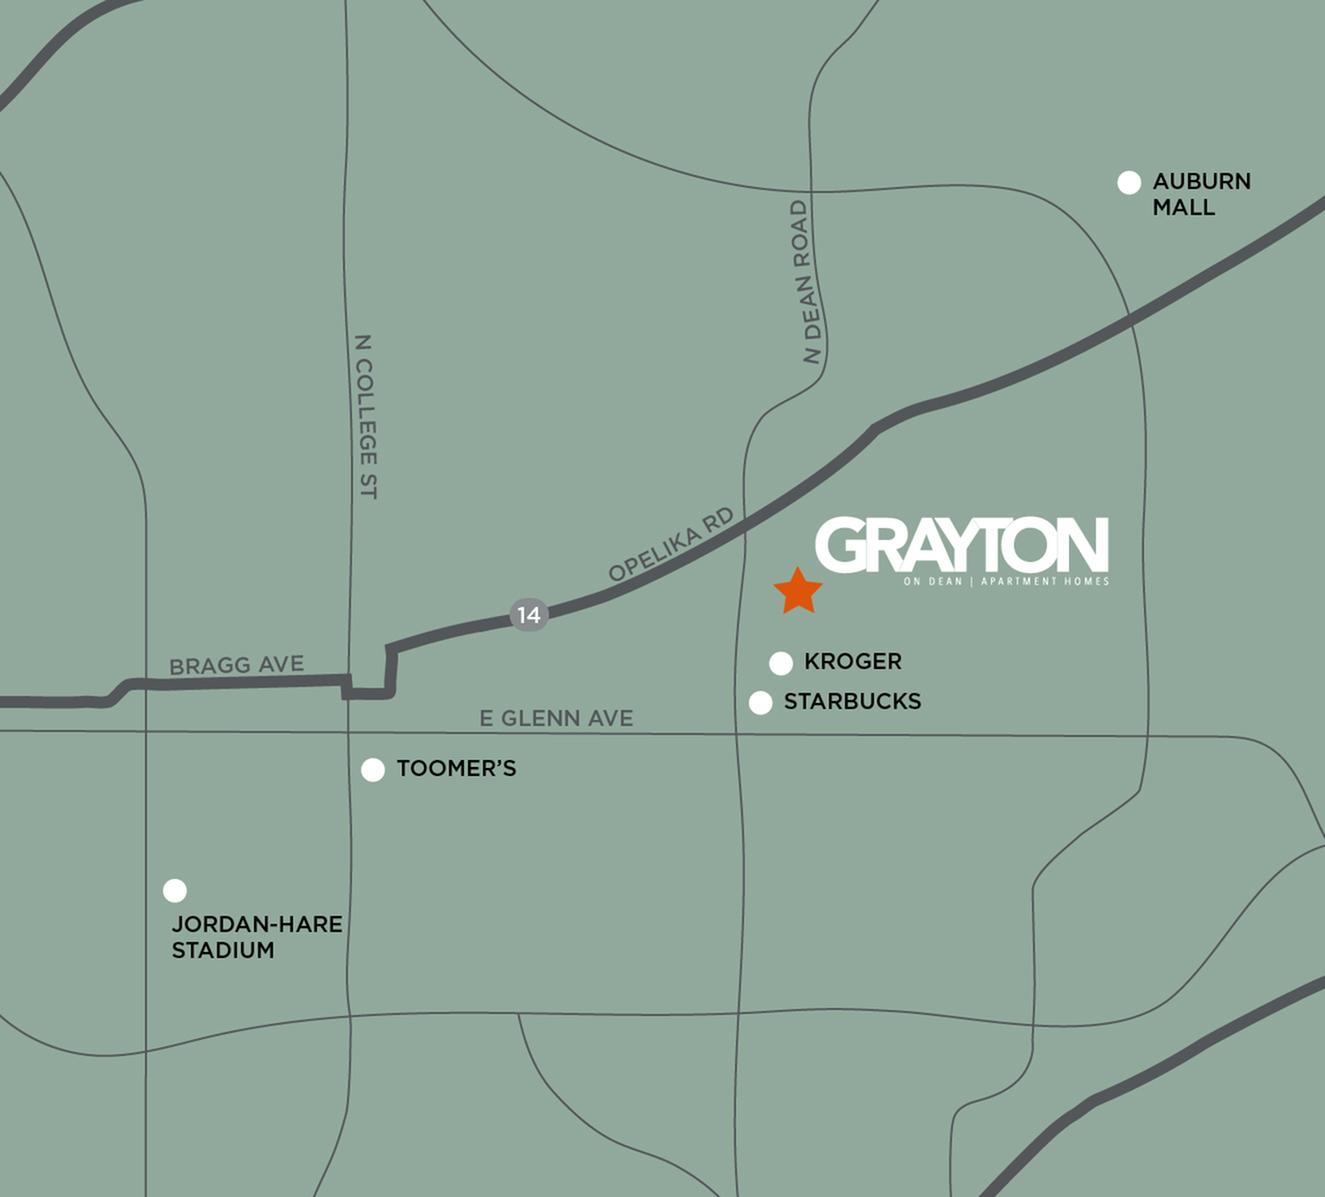 colroful neighborhood map with markers